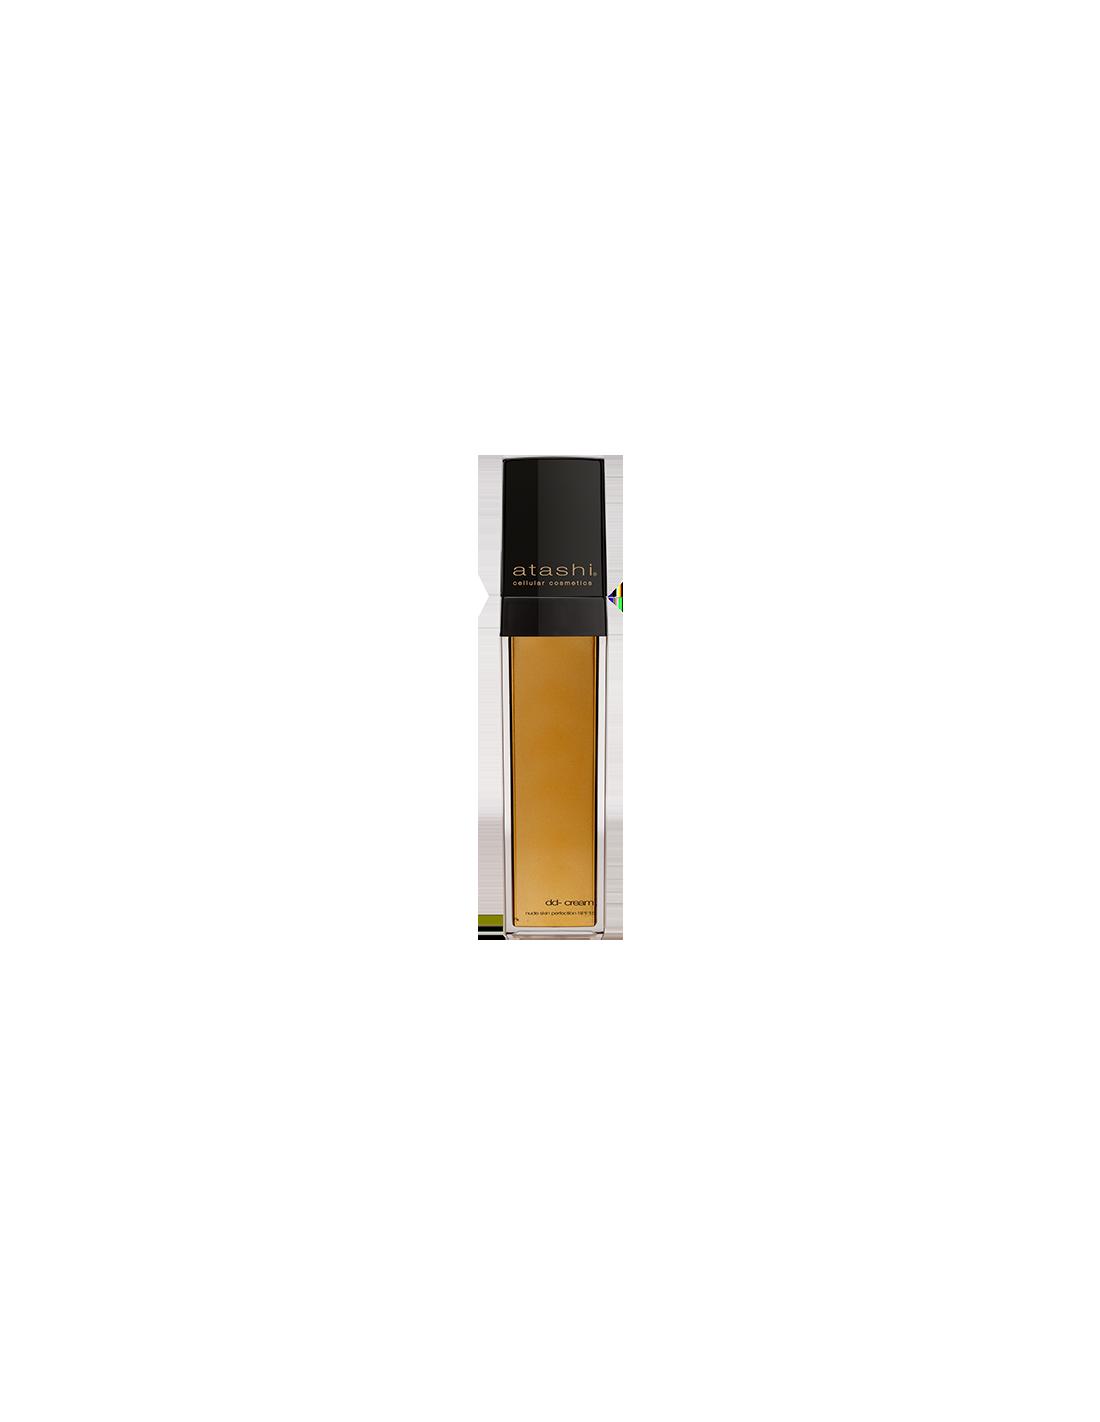 Atashi® Cellular Cosmetics DD cream nude skin SPF15+ tono